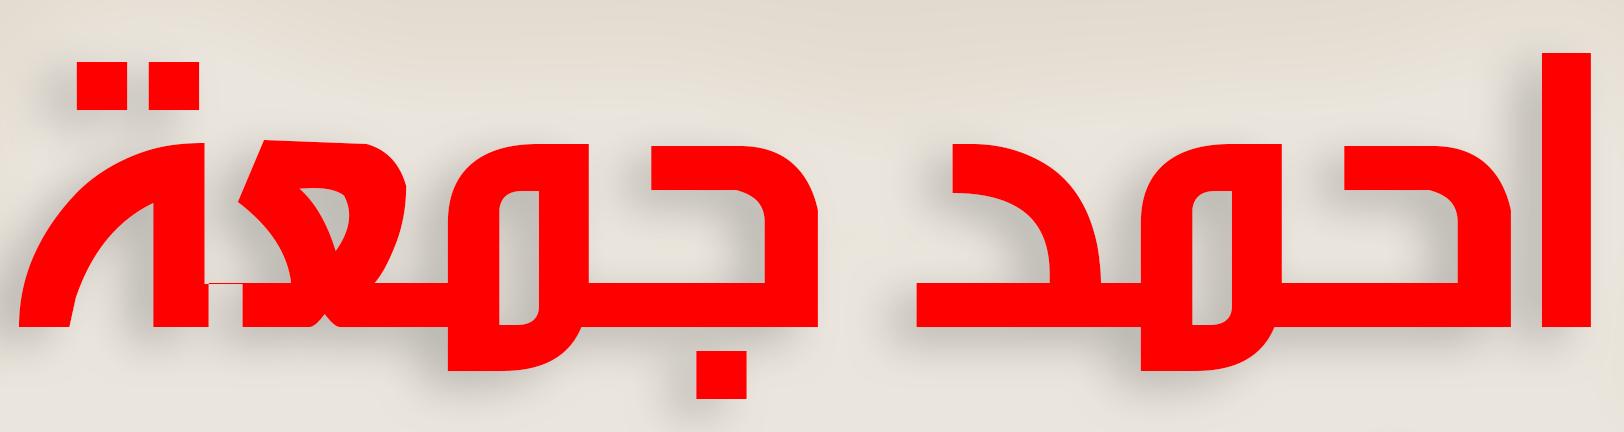 cropped-احمد-جمعة-1.png